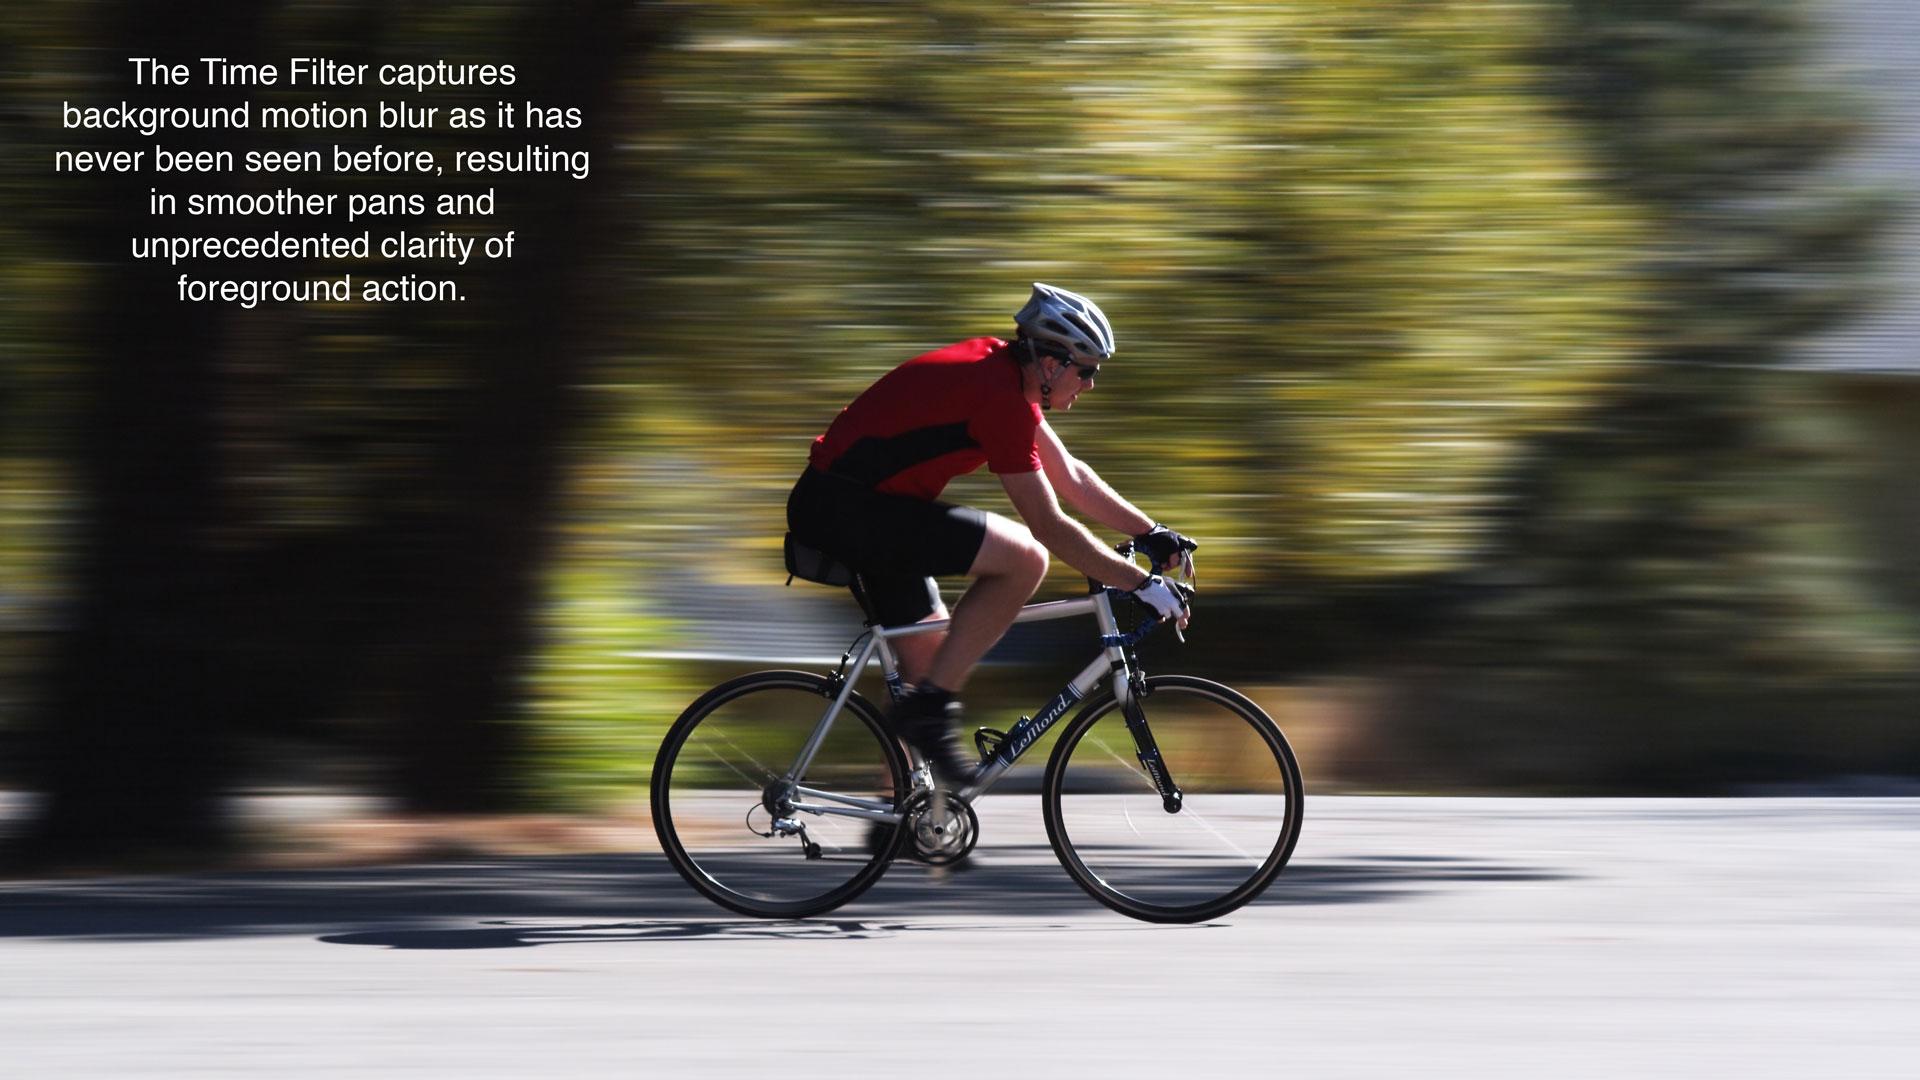 Bicycle-Circle-w-Text2.jpg